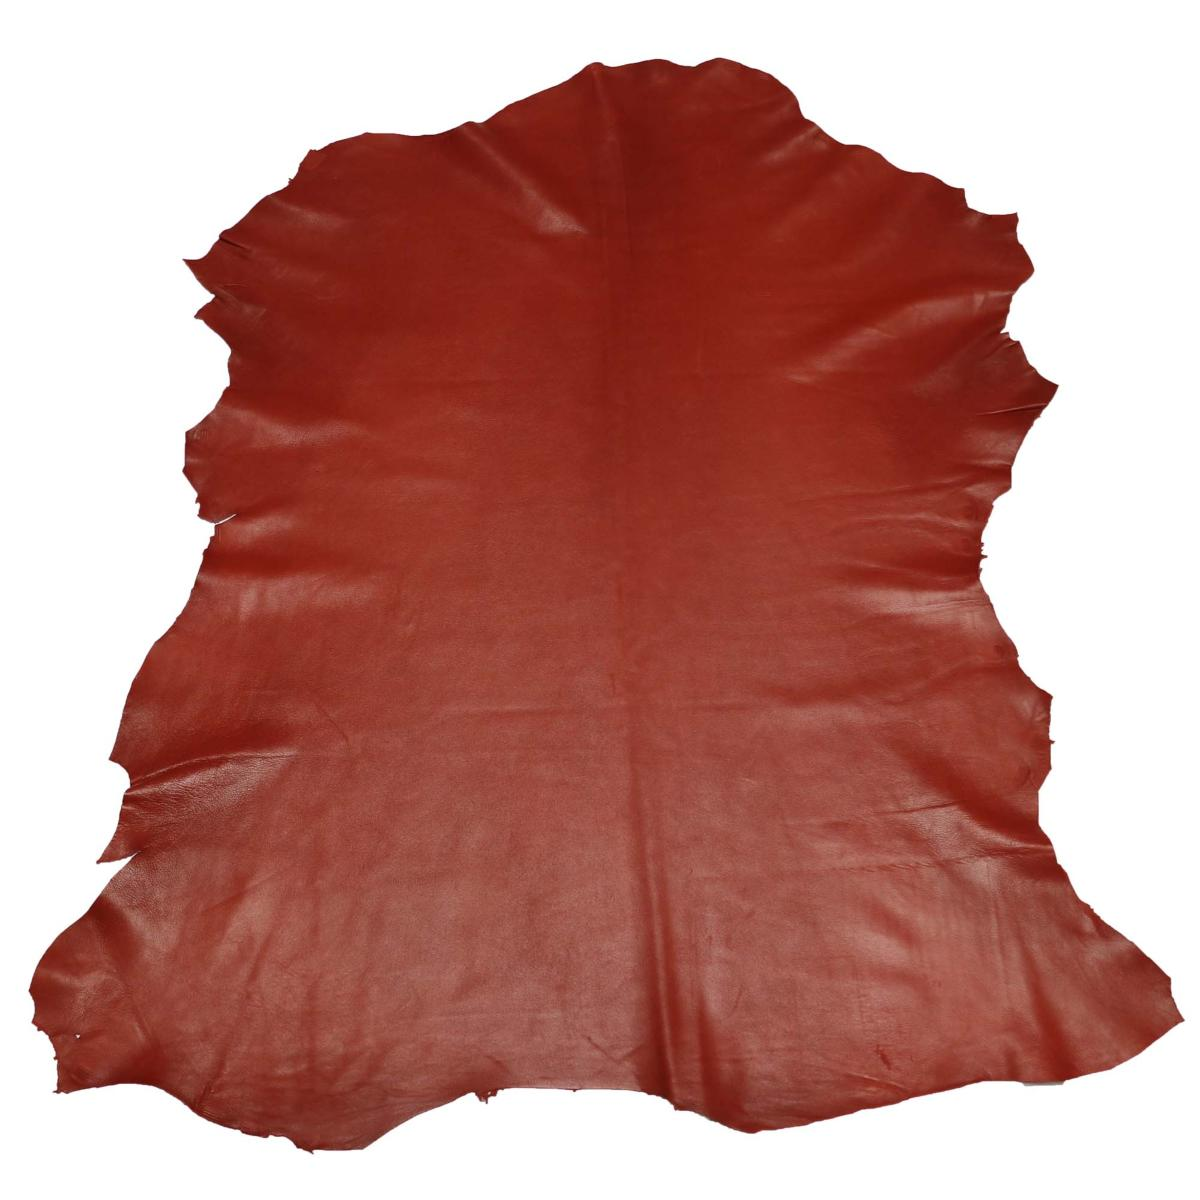 Peau de cuir d'agneau nappa - BRIQUE C30   Deco cuir